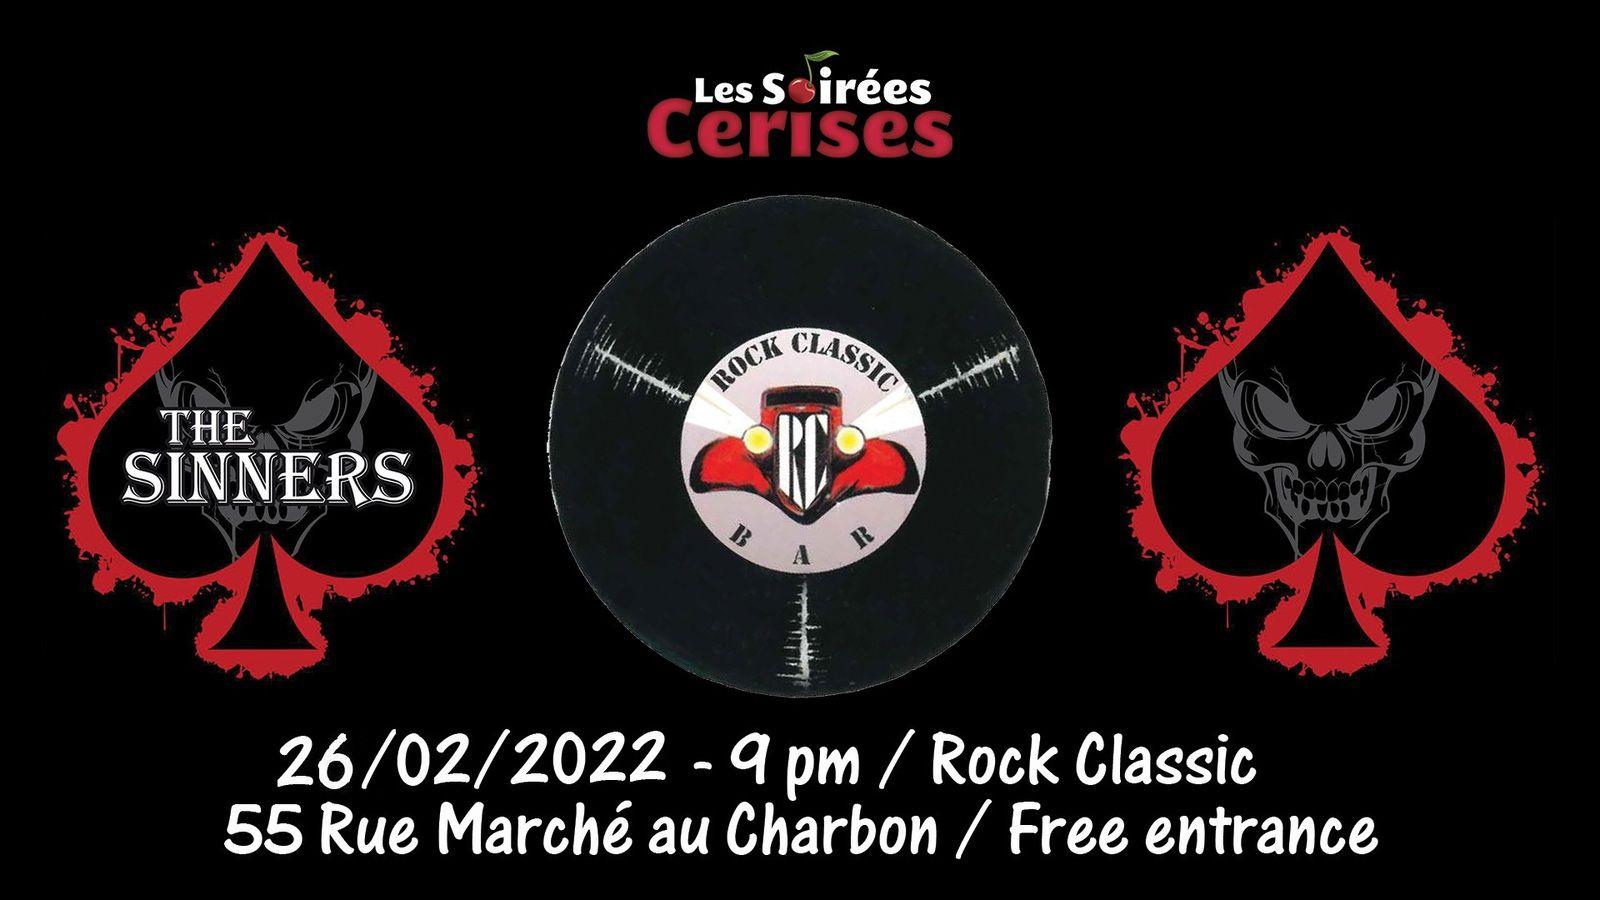 🎵 The Sinners (F) @ Rock Classic - 26/02/2022